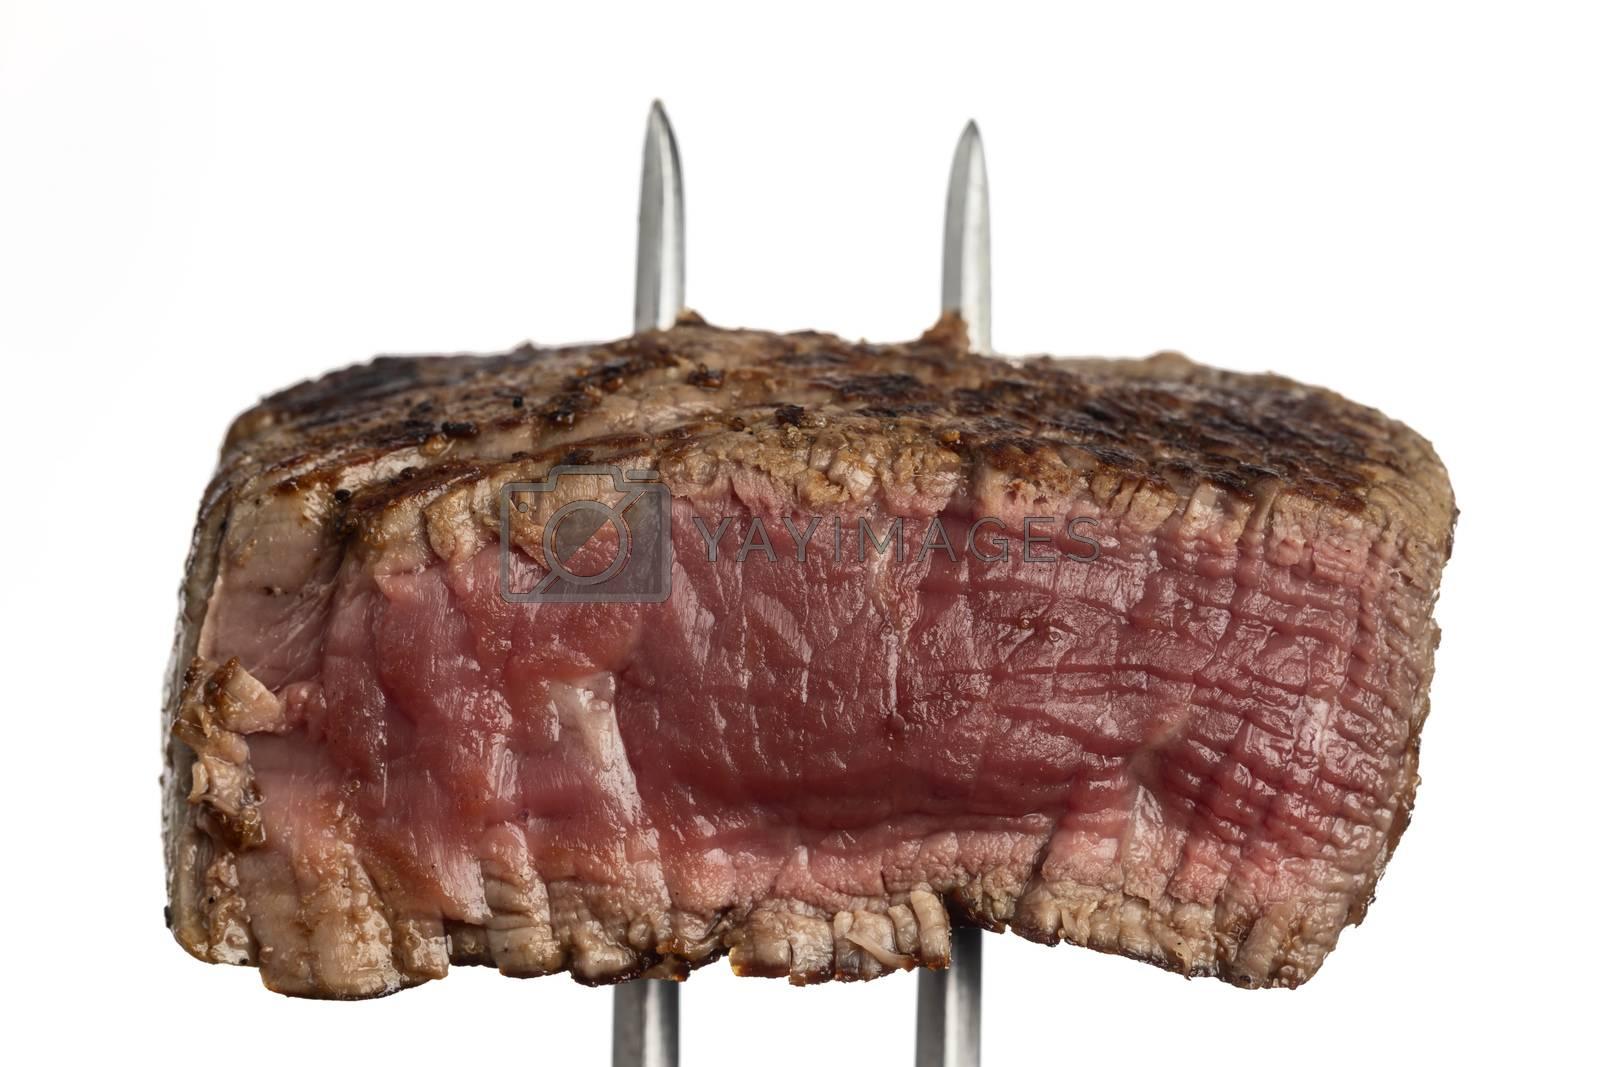 grilled steak on a meat fork